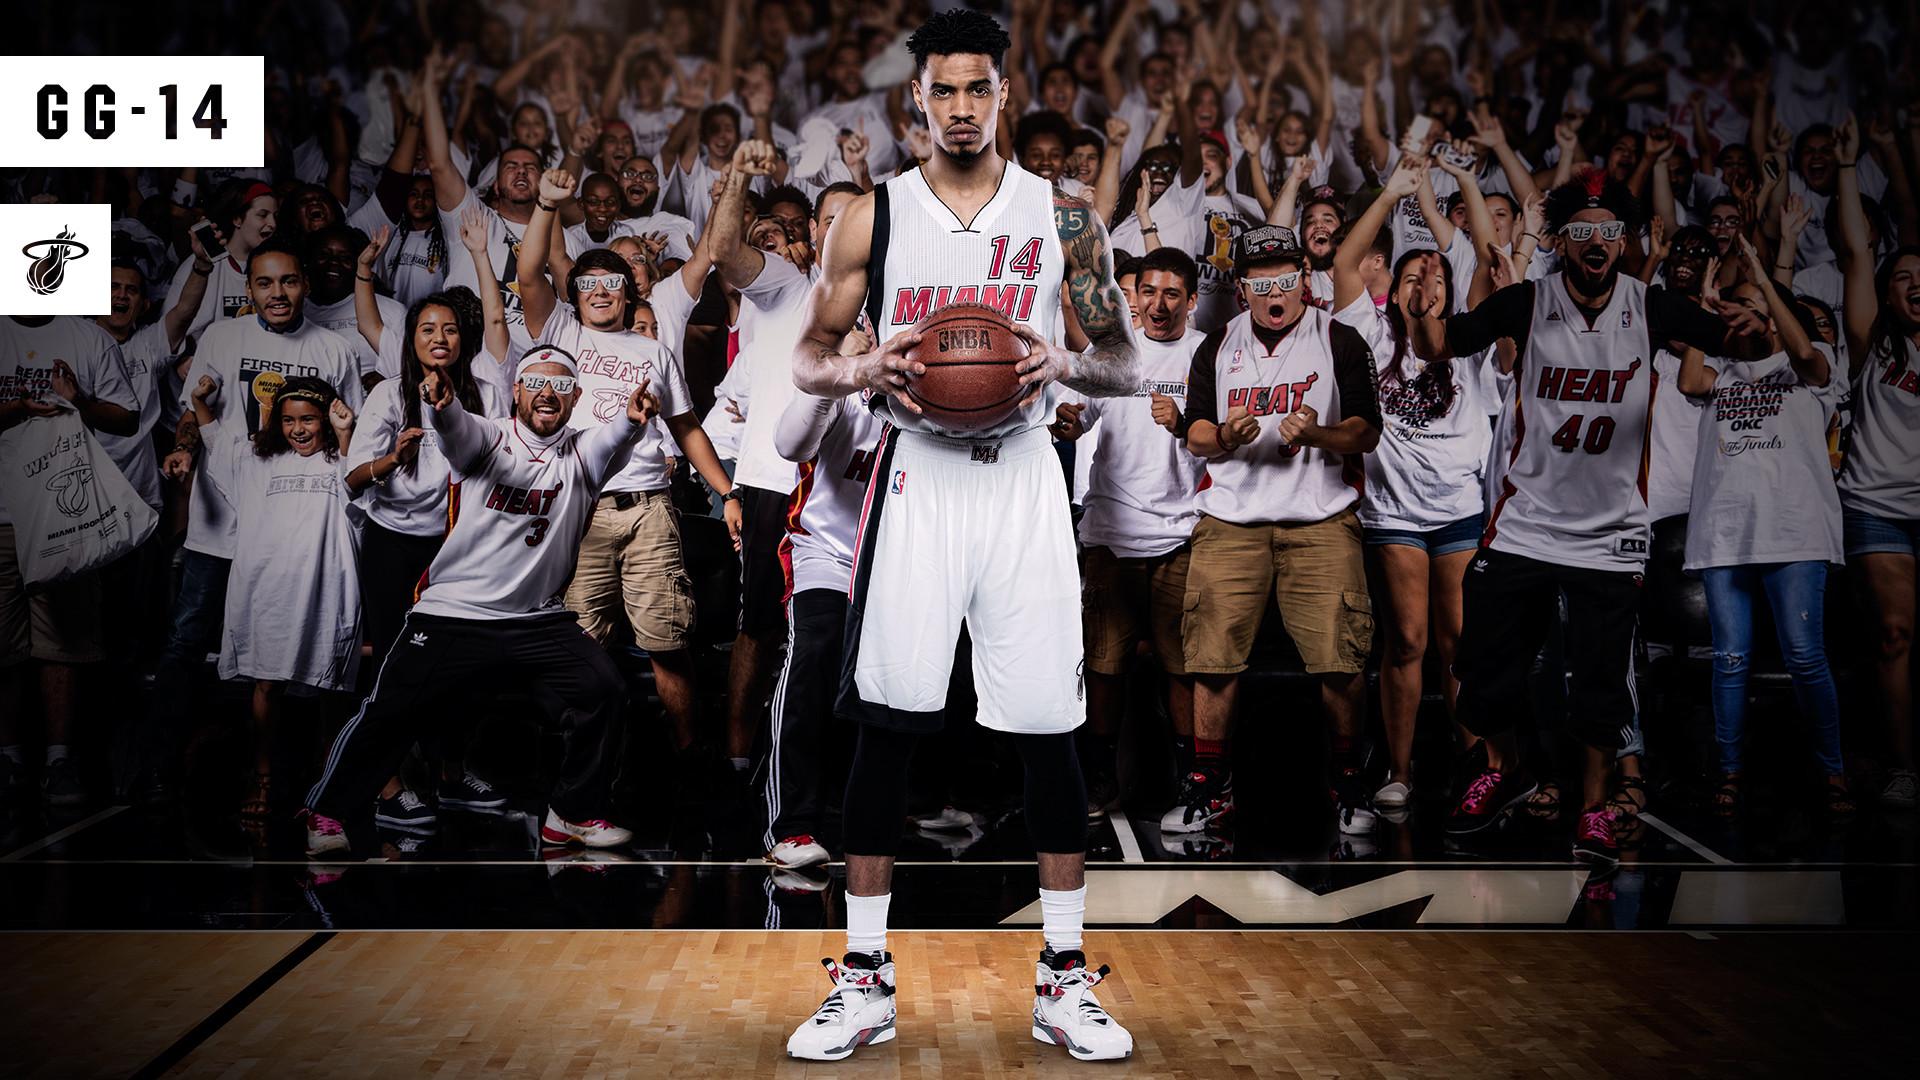 NBA Wallpaper 1080p hd background hd screensavers hd wallpaper .